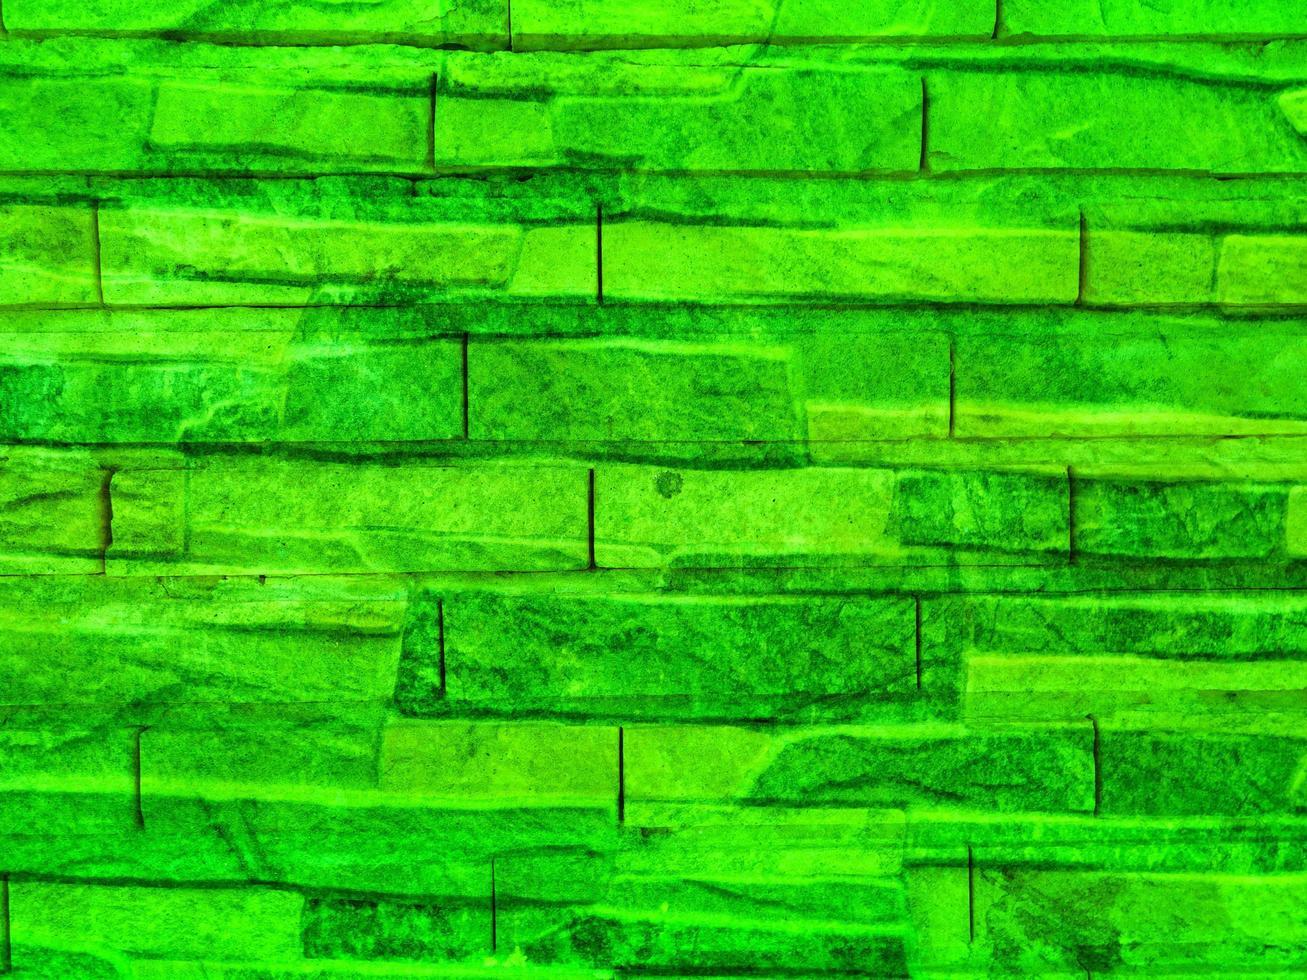 groene steen textuur foto